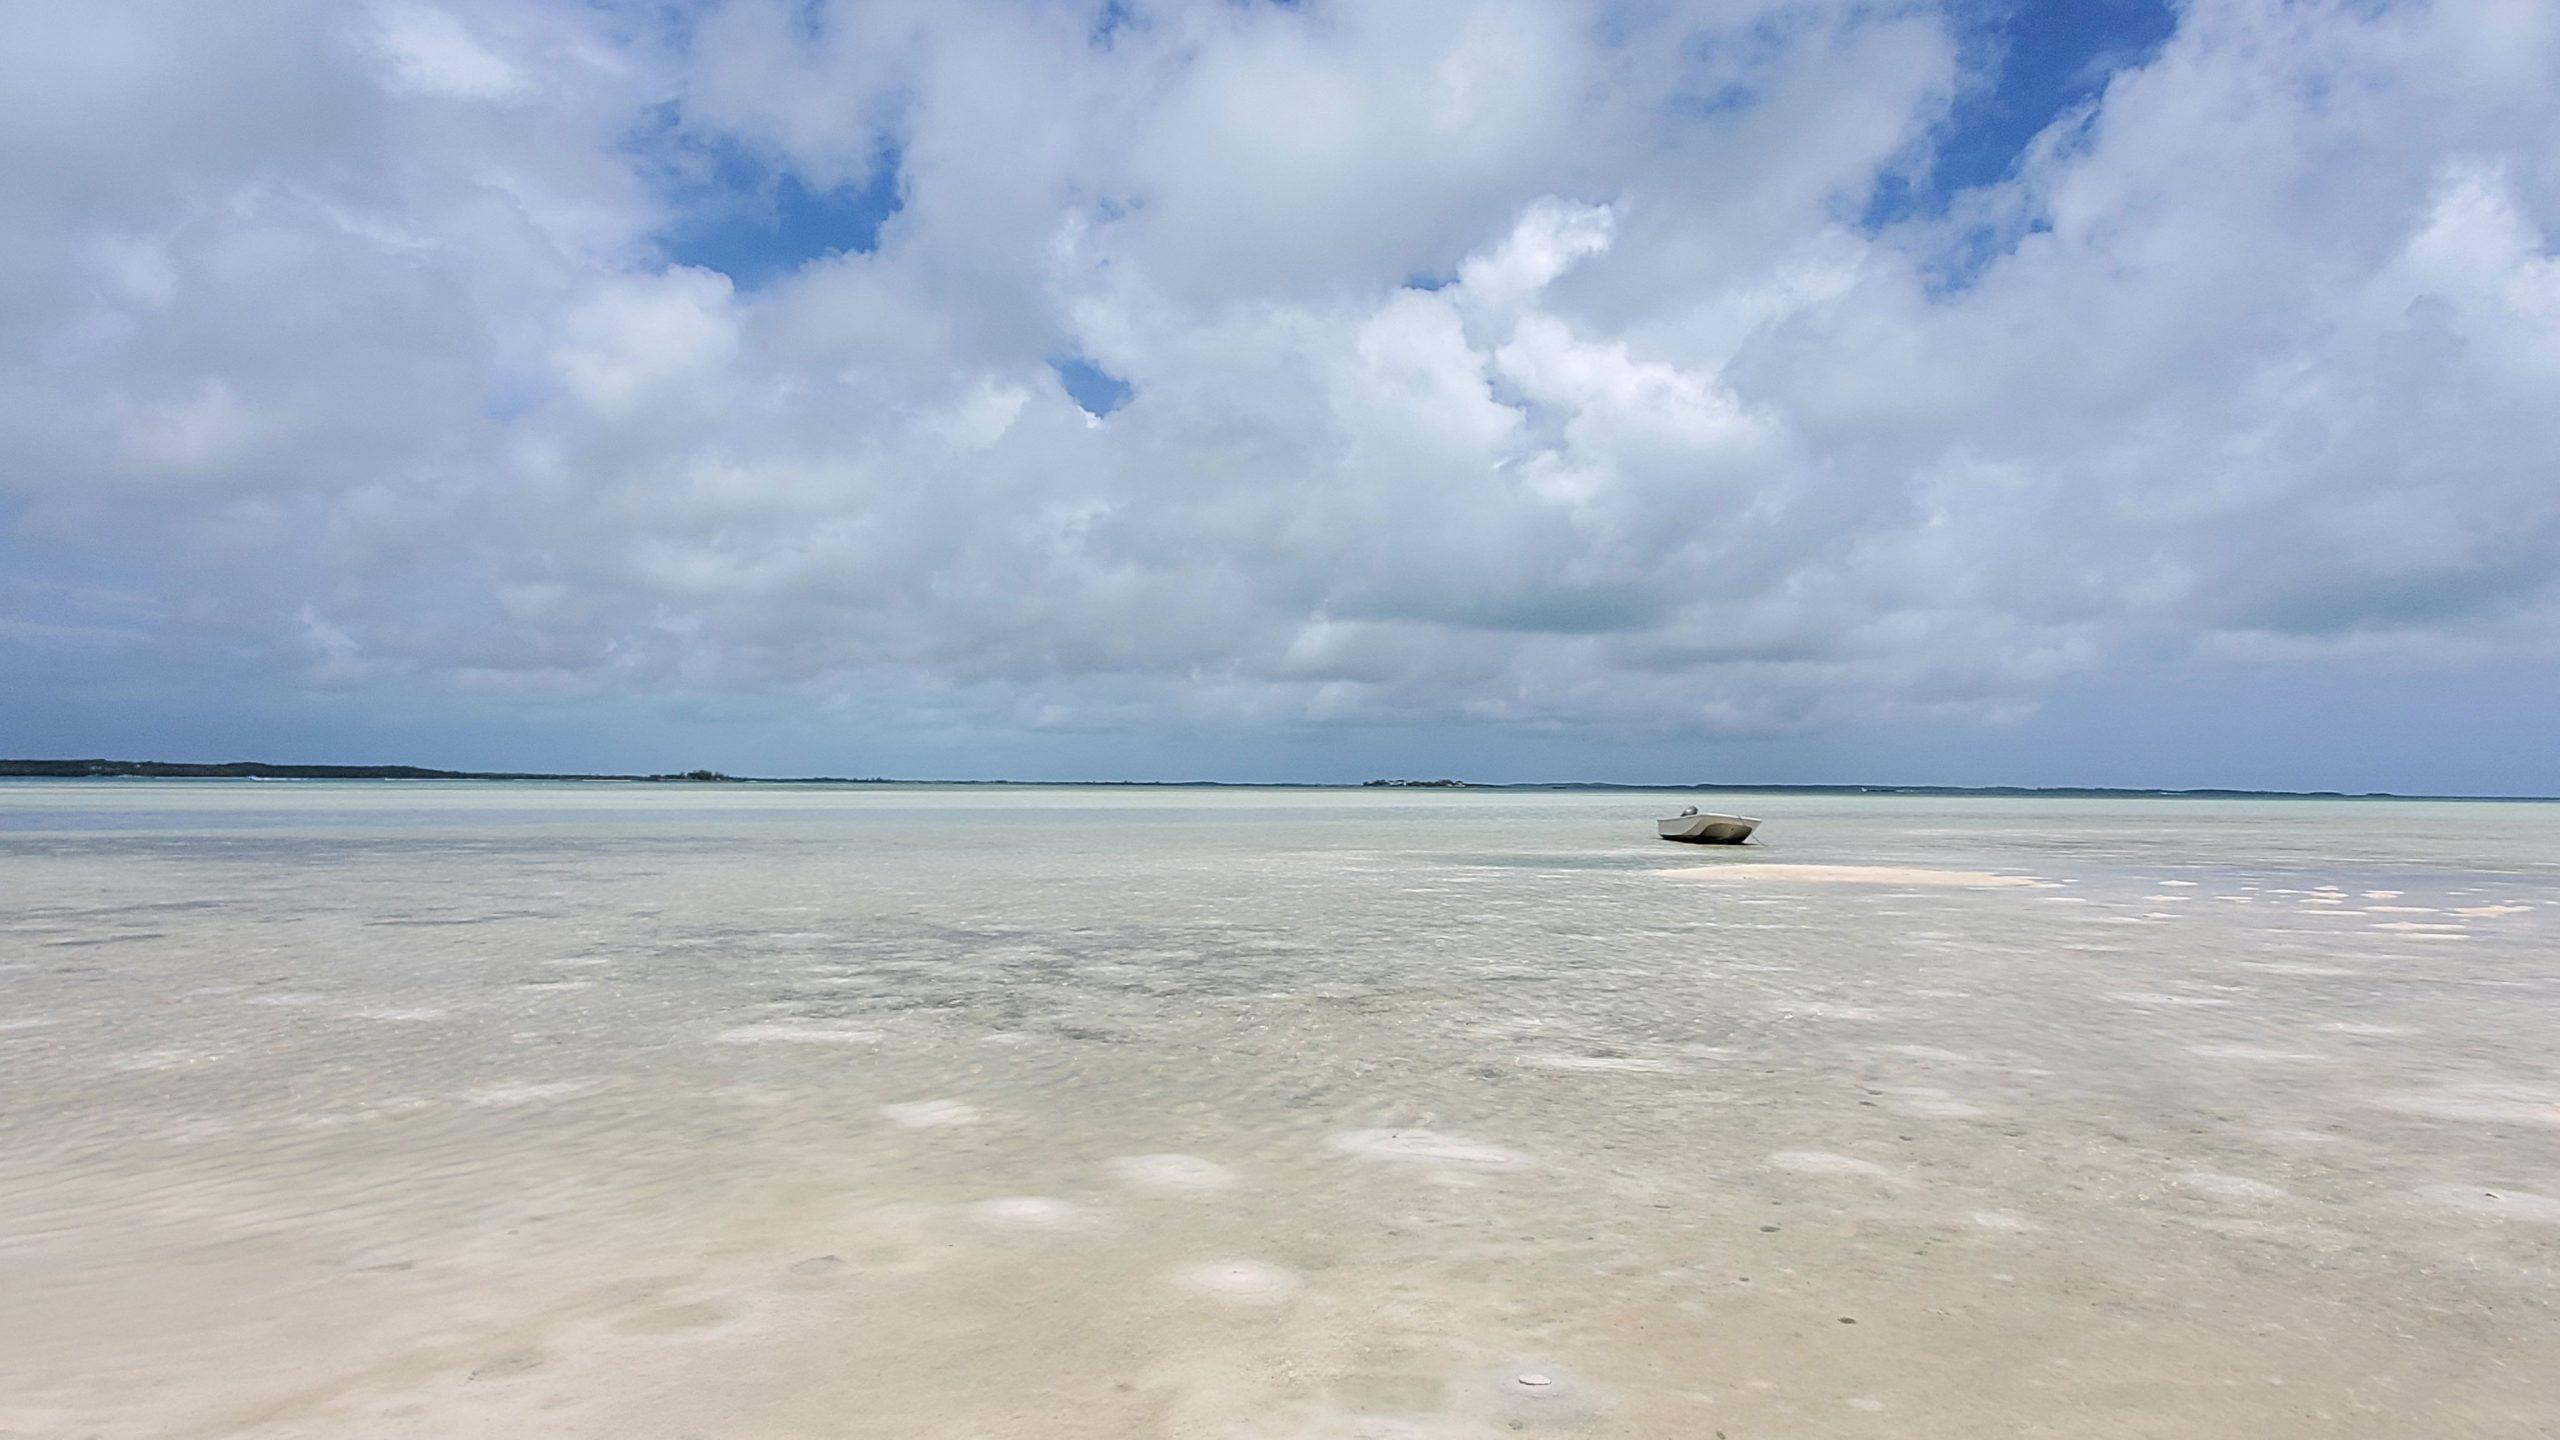 07-2021-Briland-Club-Marina-Boat-on-the-Beach